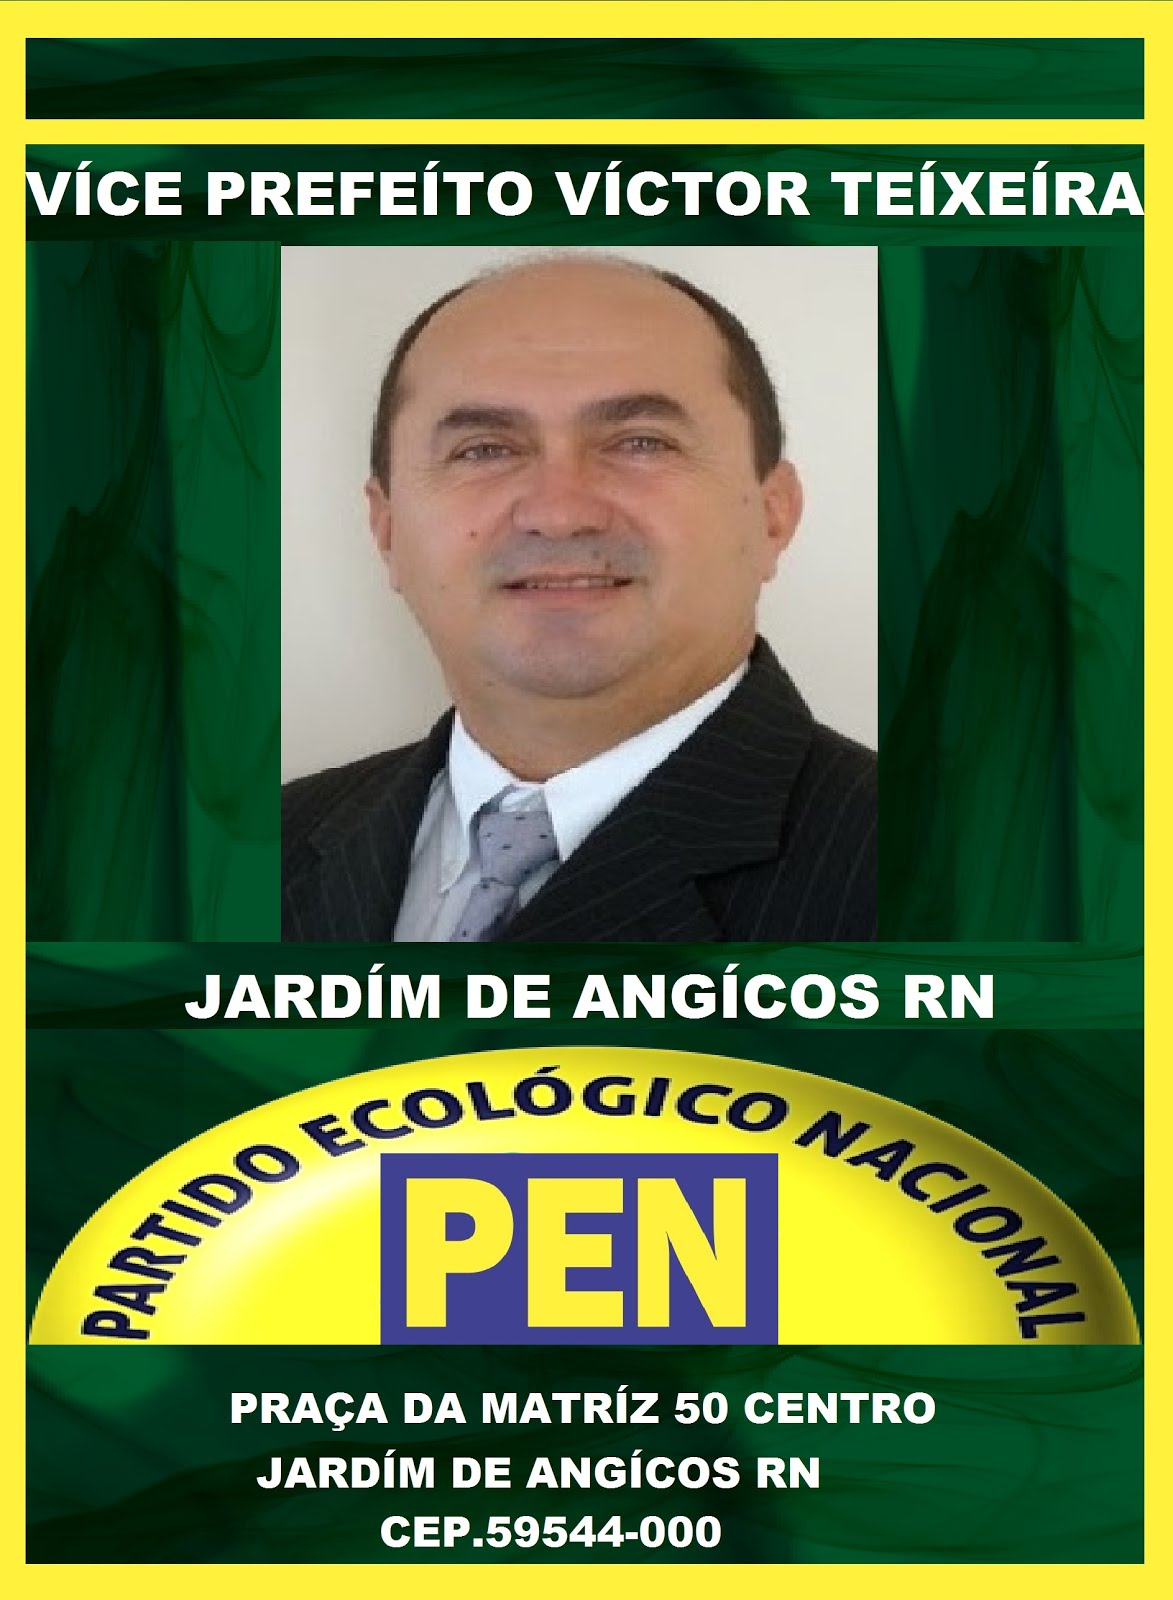 VICTOR TEIXEIRA JARDIM DE ANGICOS RN.